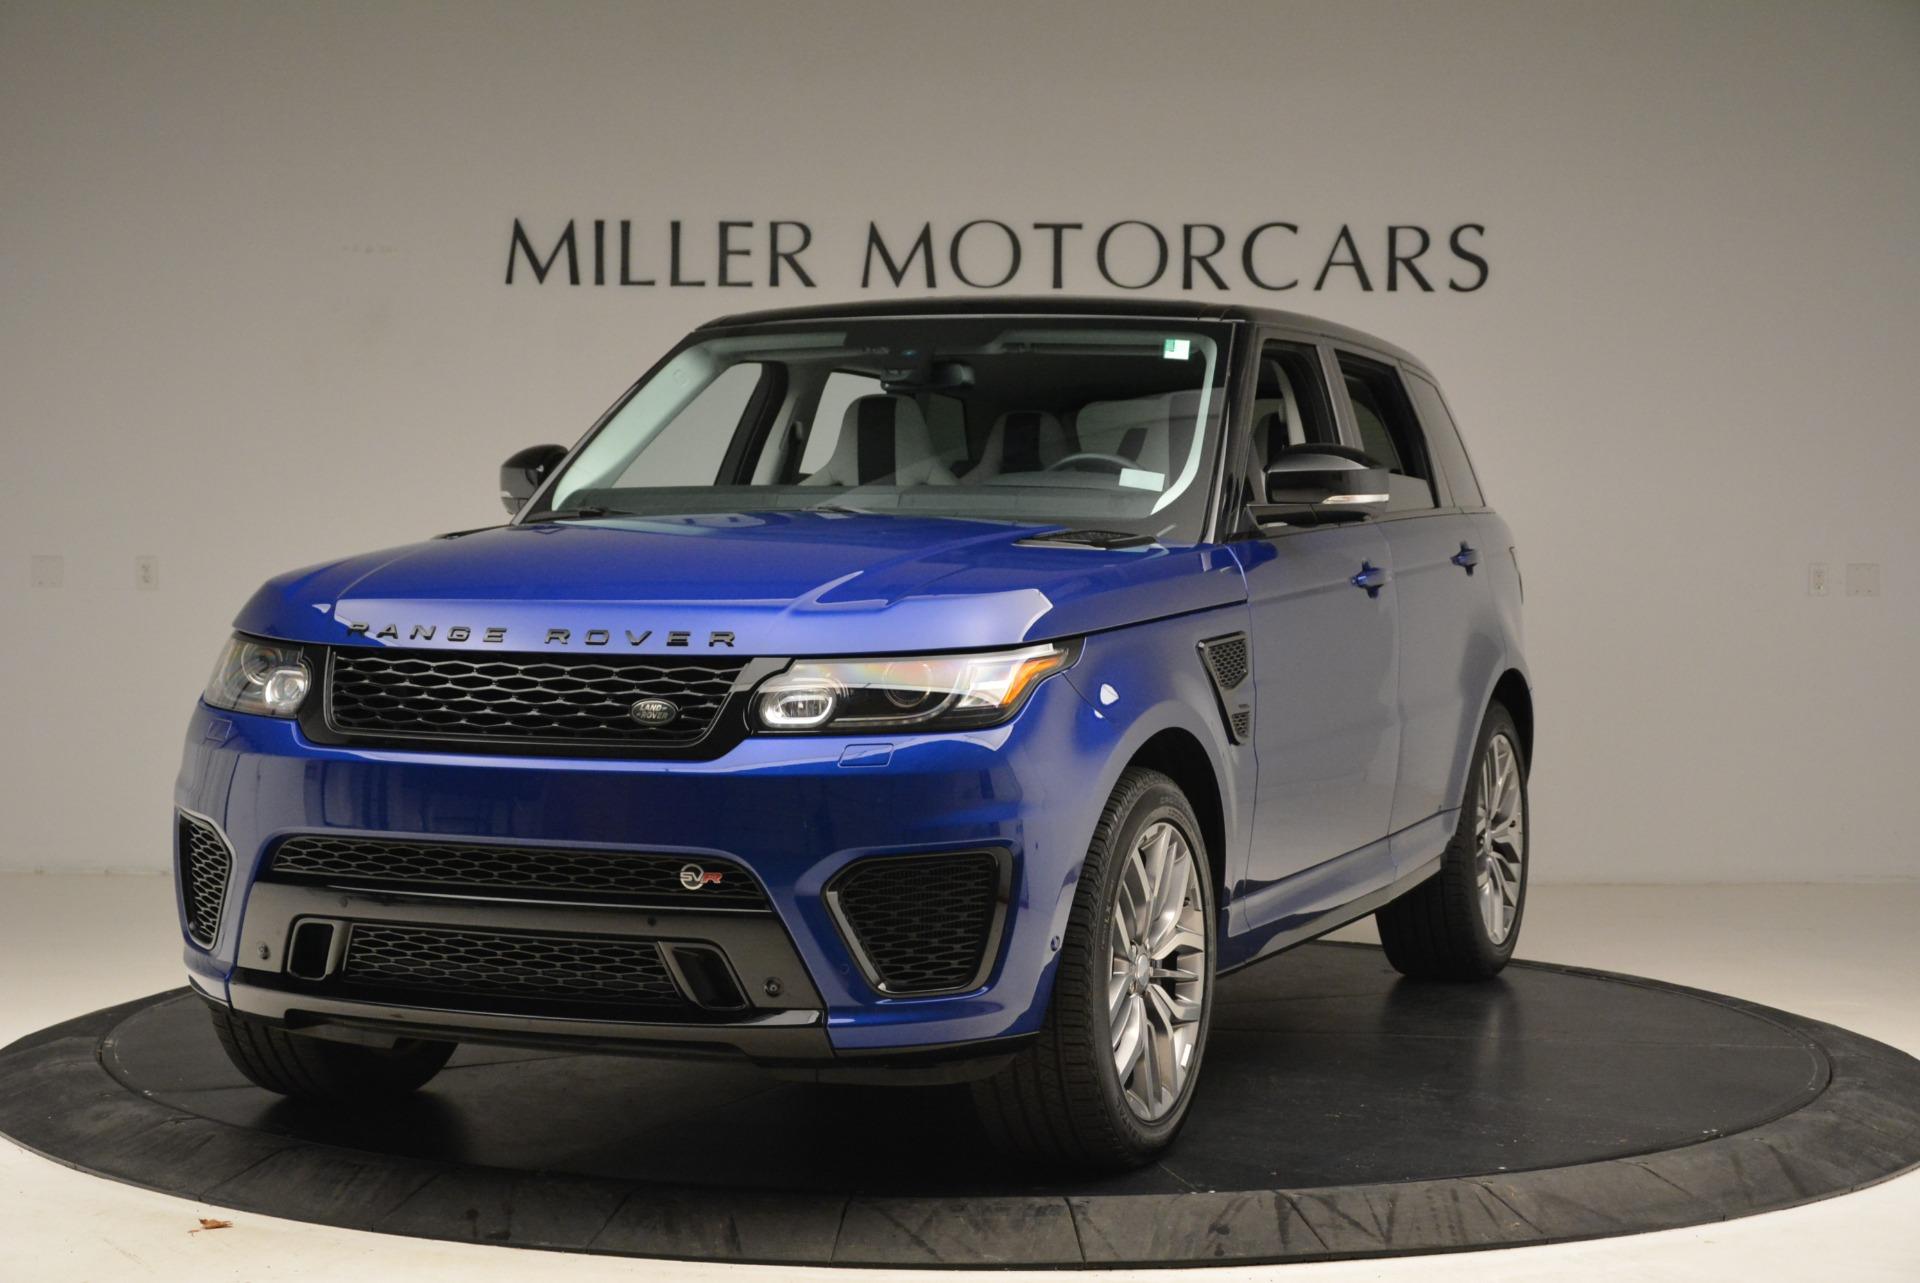 Used 2015 Land Rover Range Rover Sport SVR for sale Sold at Alfa Romeo of Westport in Westport CT 06880 1